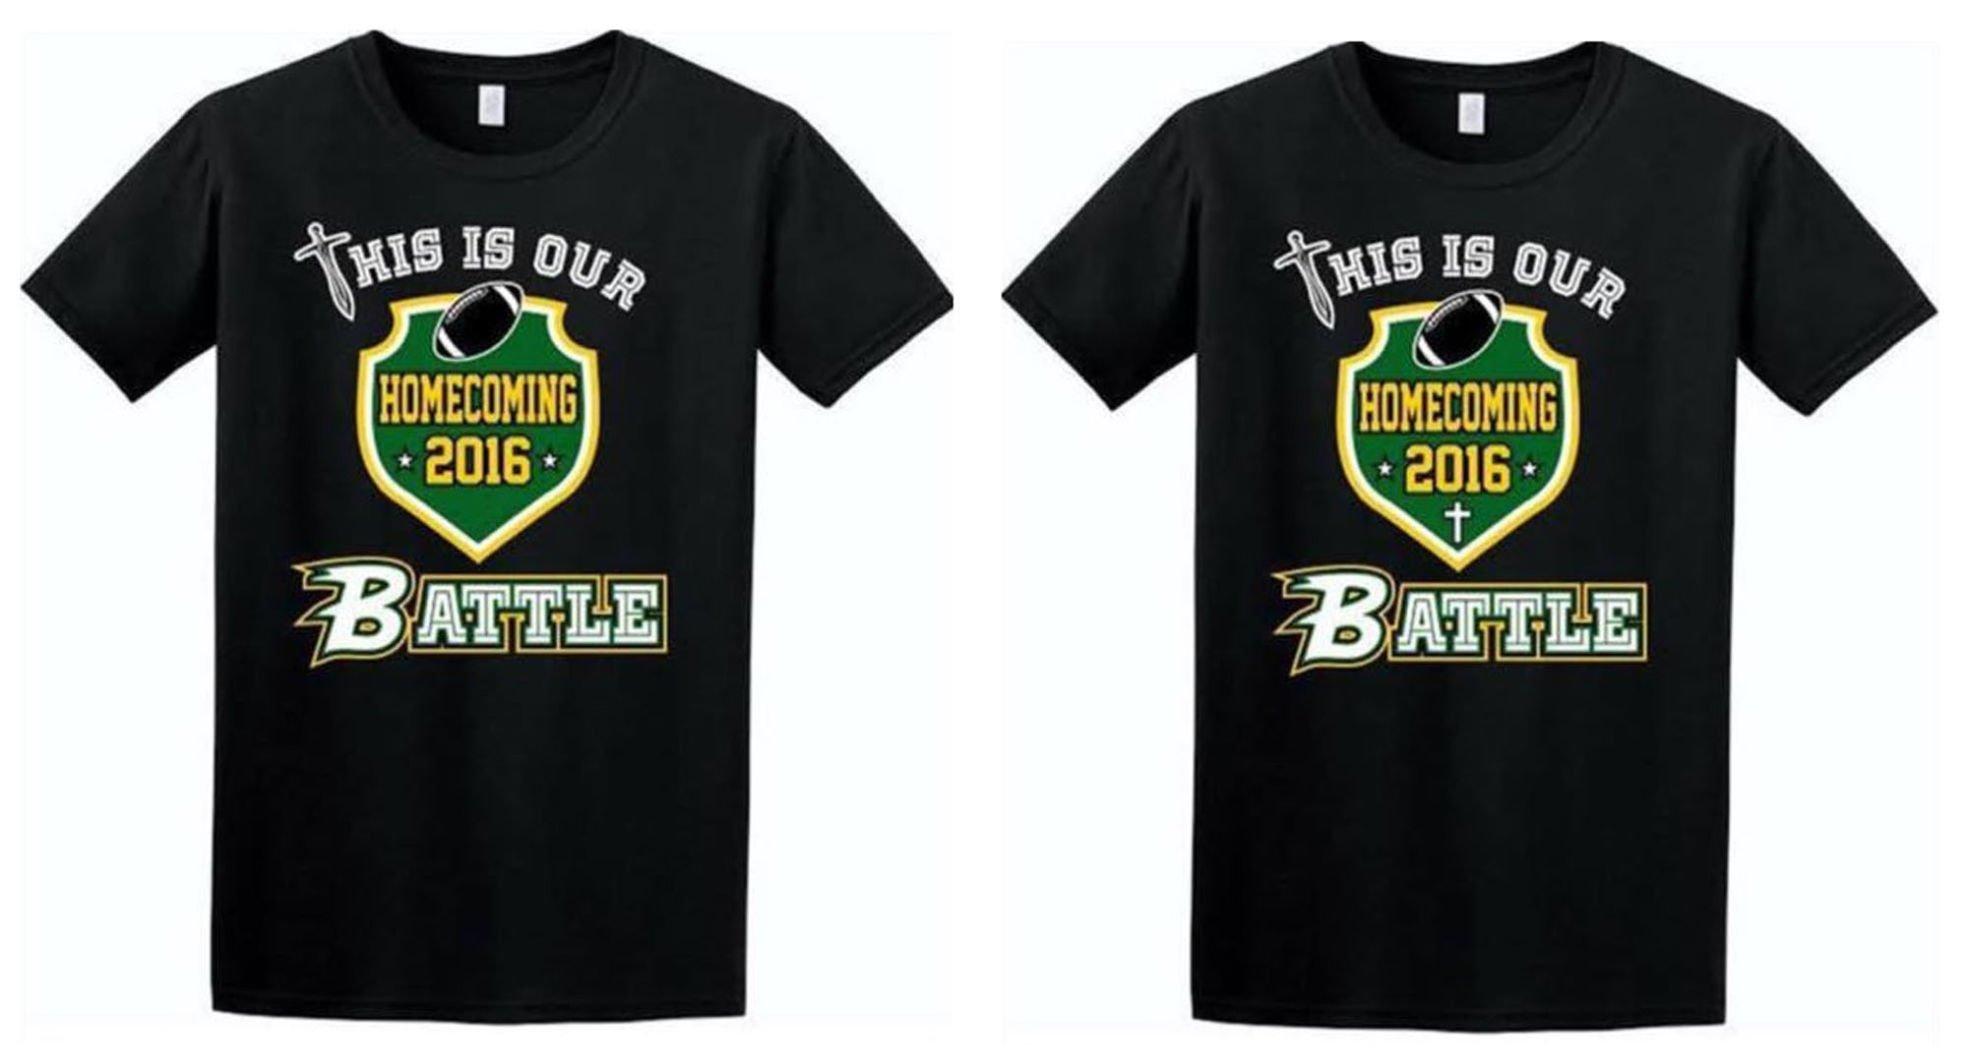 Controversy Surrounds Shirt Design For John S. Battleu0027s Homecoming